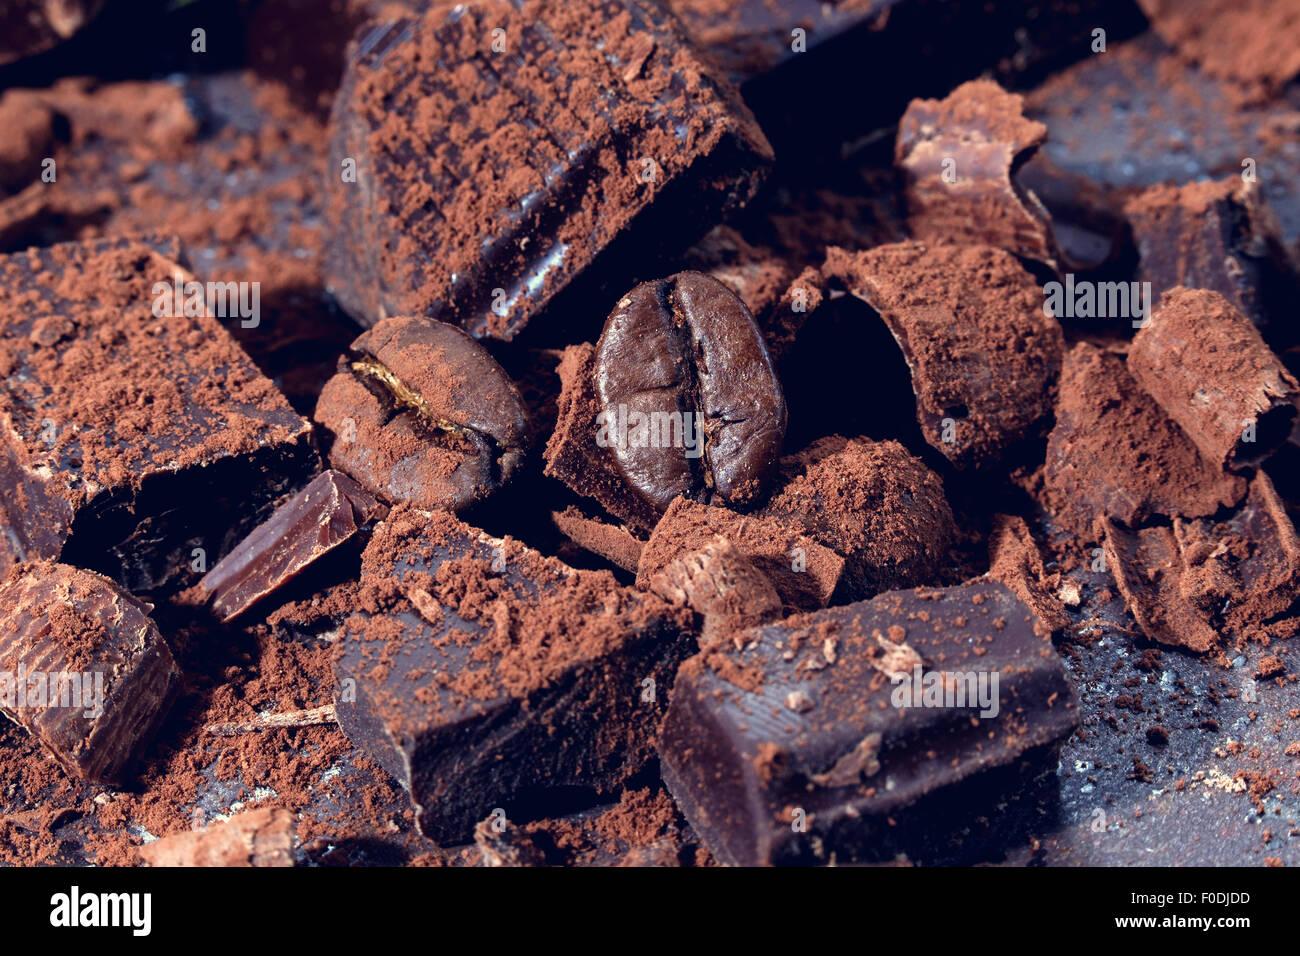 Broken dark chocolate on a wooden table Stock Photo